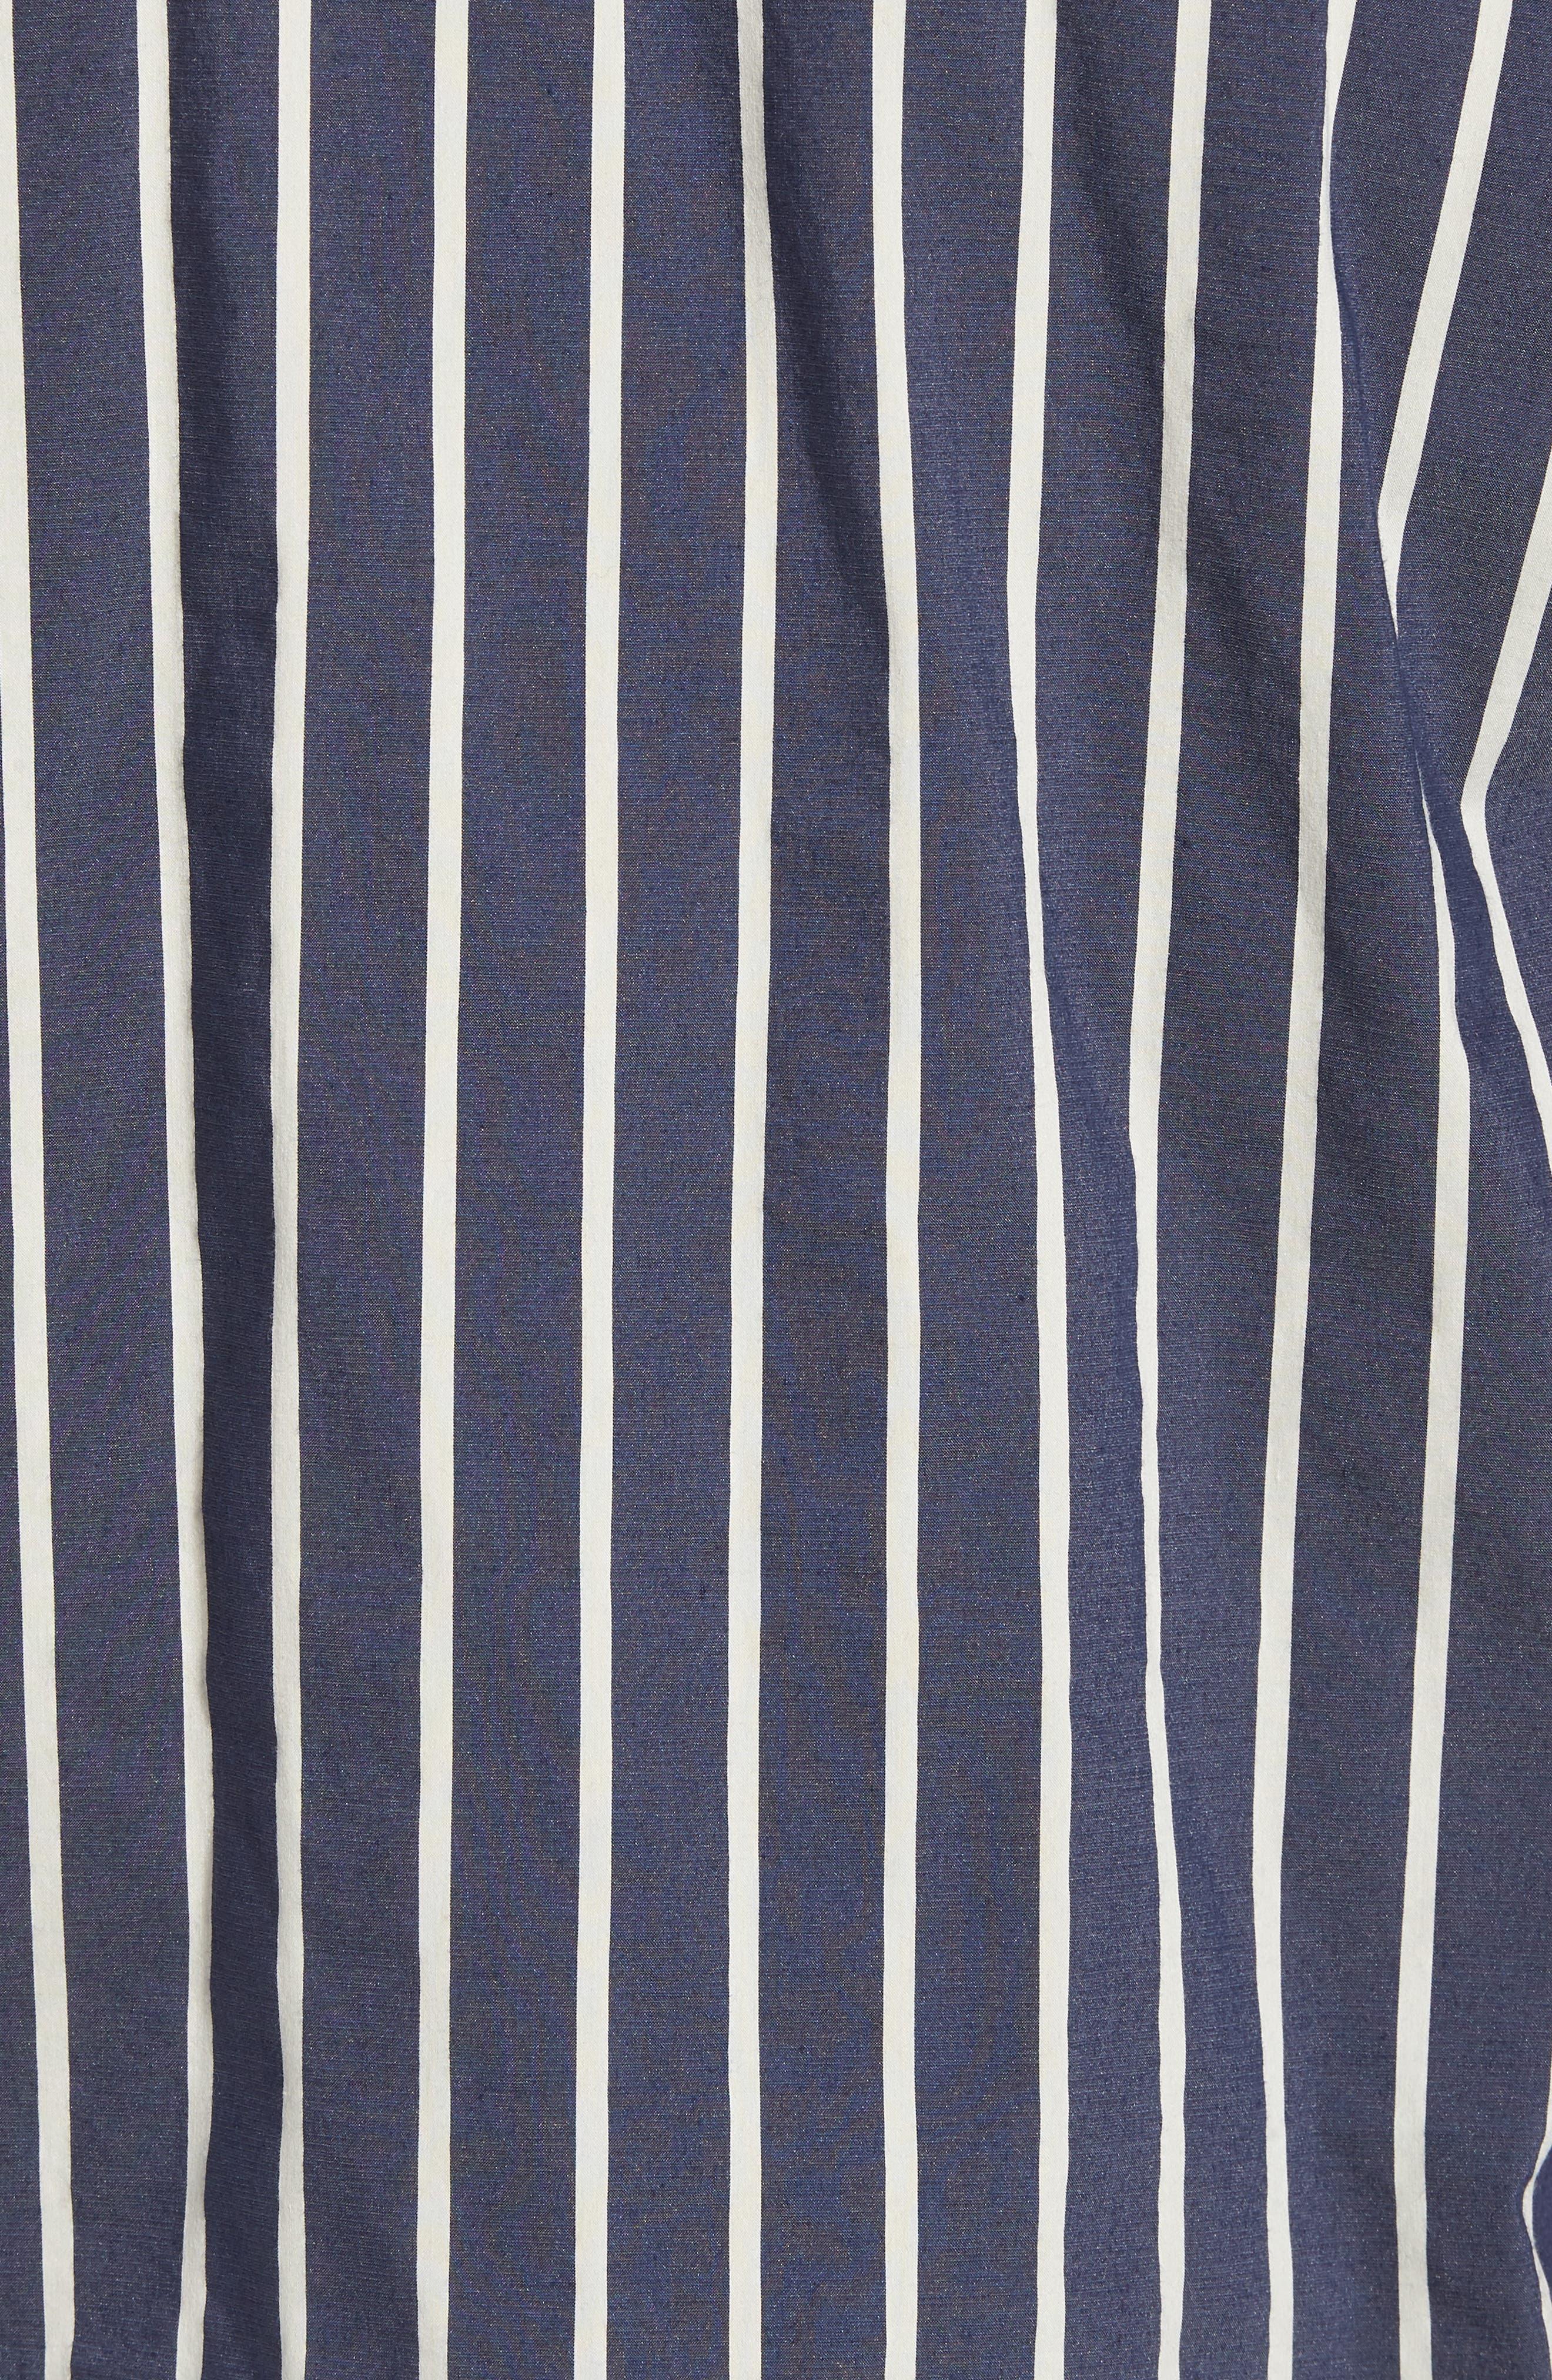 Regular Fit Stretch Short Sleeve Sport Shirt,                             Alternate thumbnail 5, color,                             New Coastal